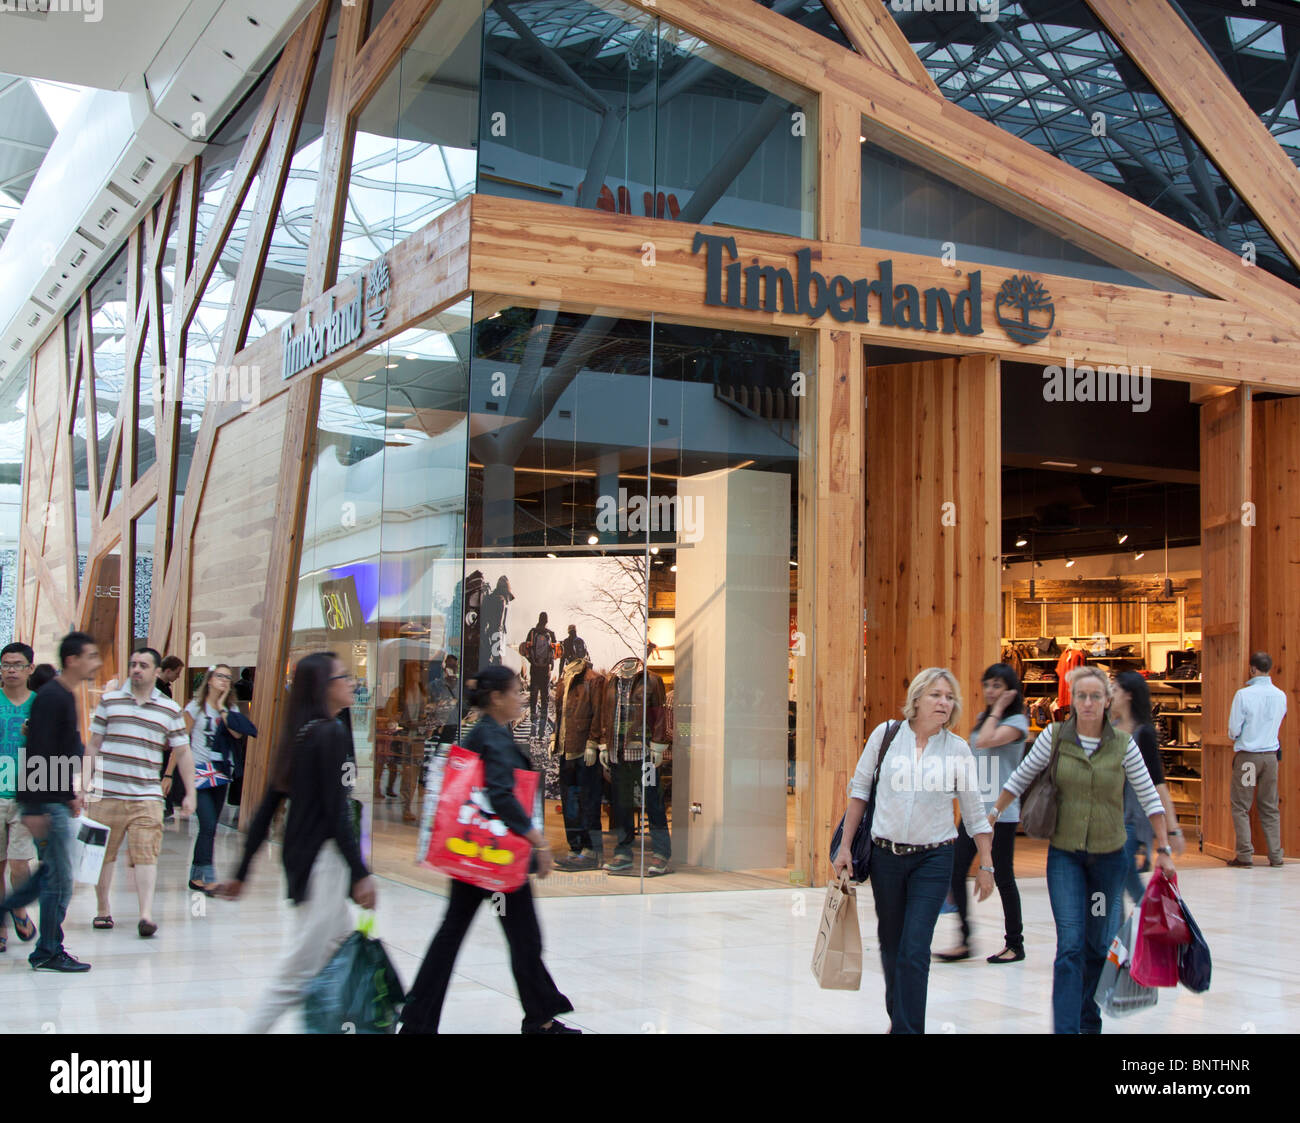 timberland shop london